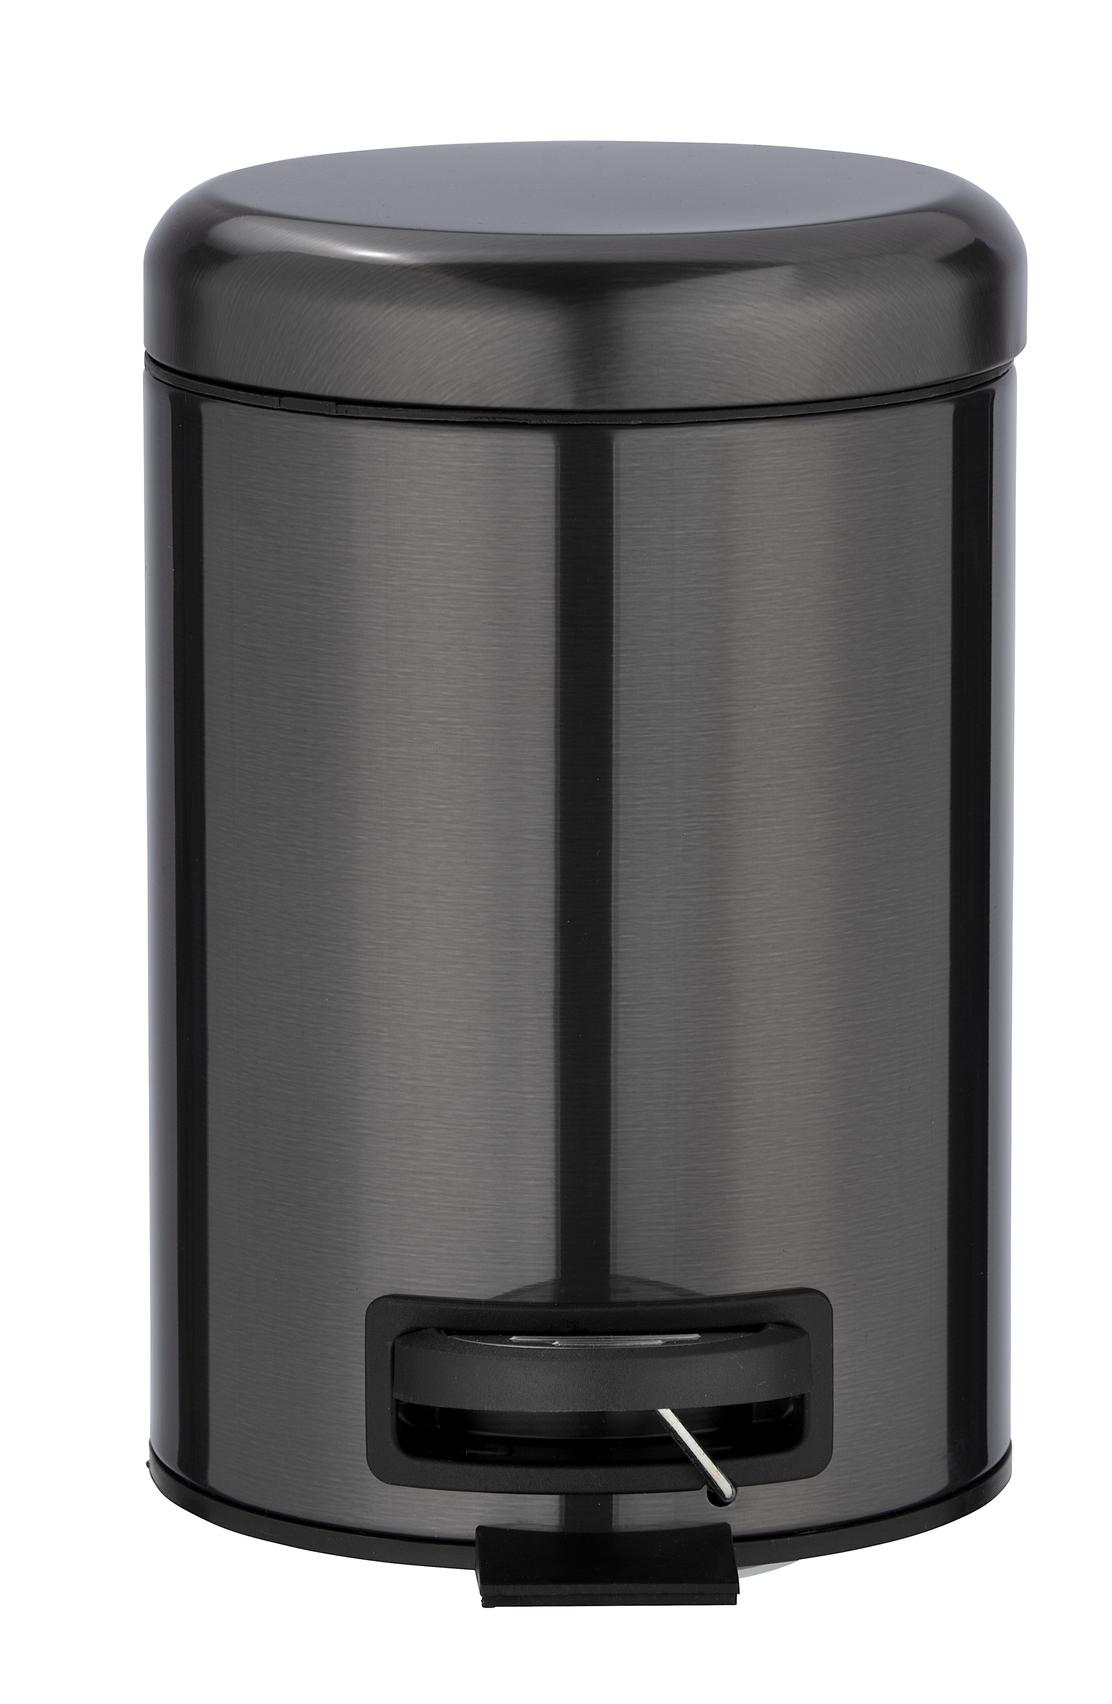 Cos de gunoi cu pedala, din otel inoxidabil, Leman Negru, 3L, Ø17xH25 cm imagine